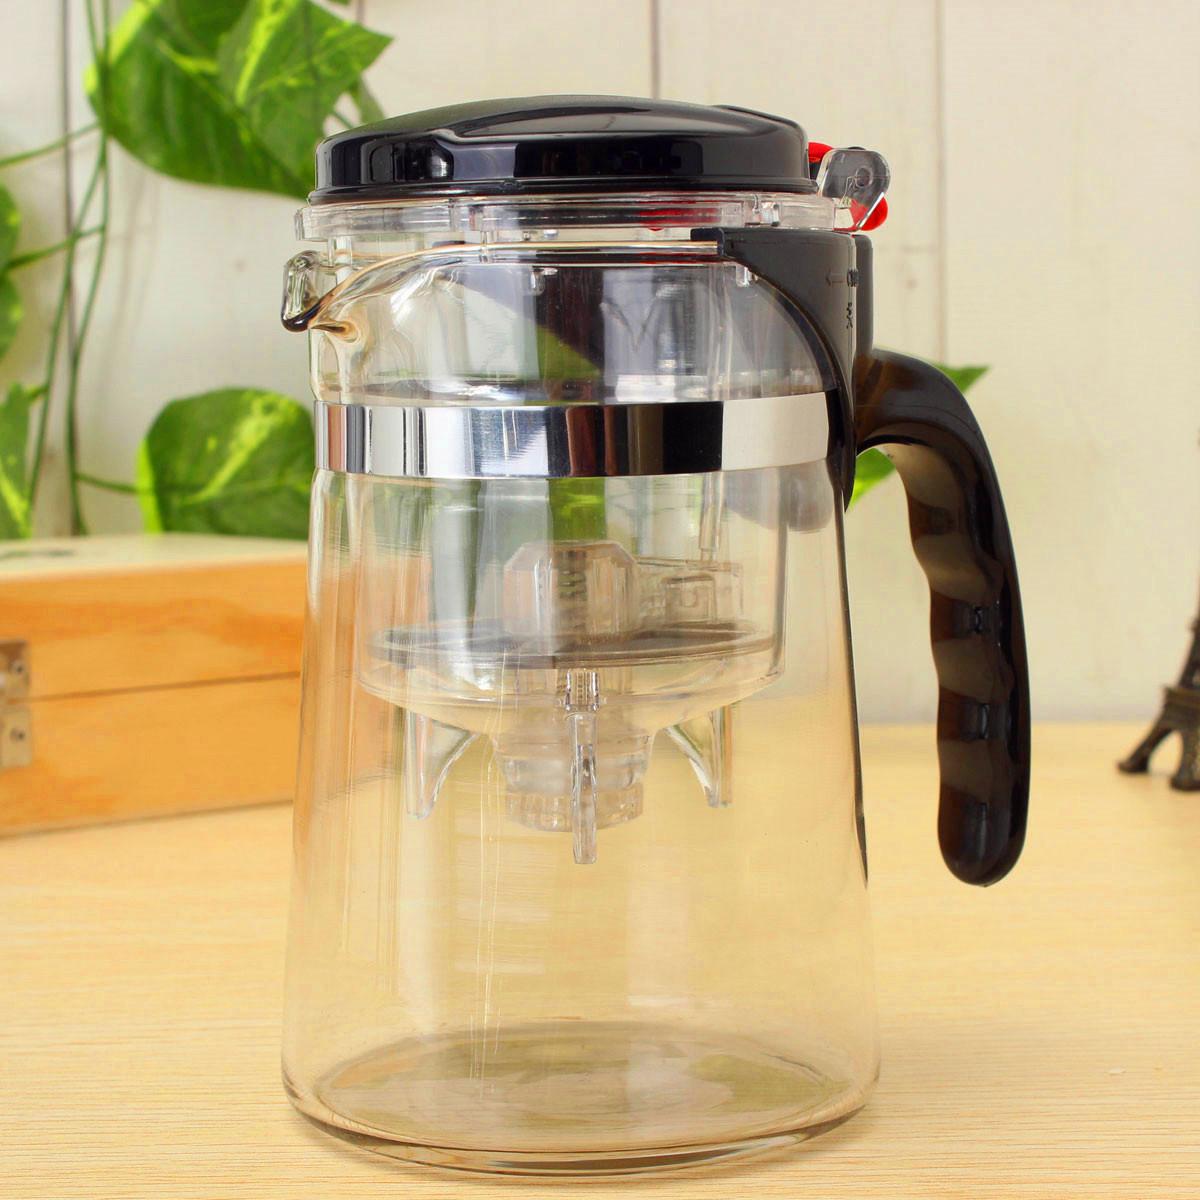 Clear Glass Tea Coffee Maker Mug Pot With Filter Infuser Straight 500ml 17Oz Lazada PH